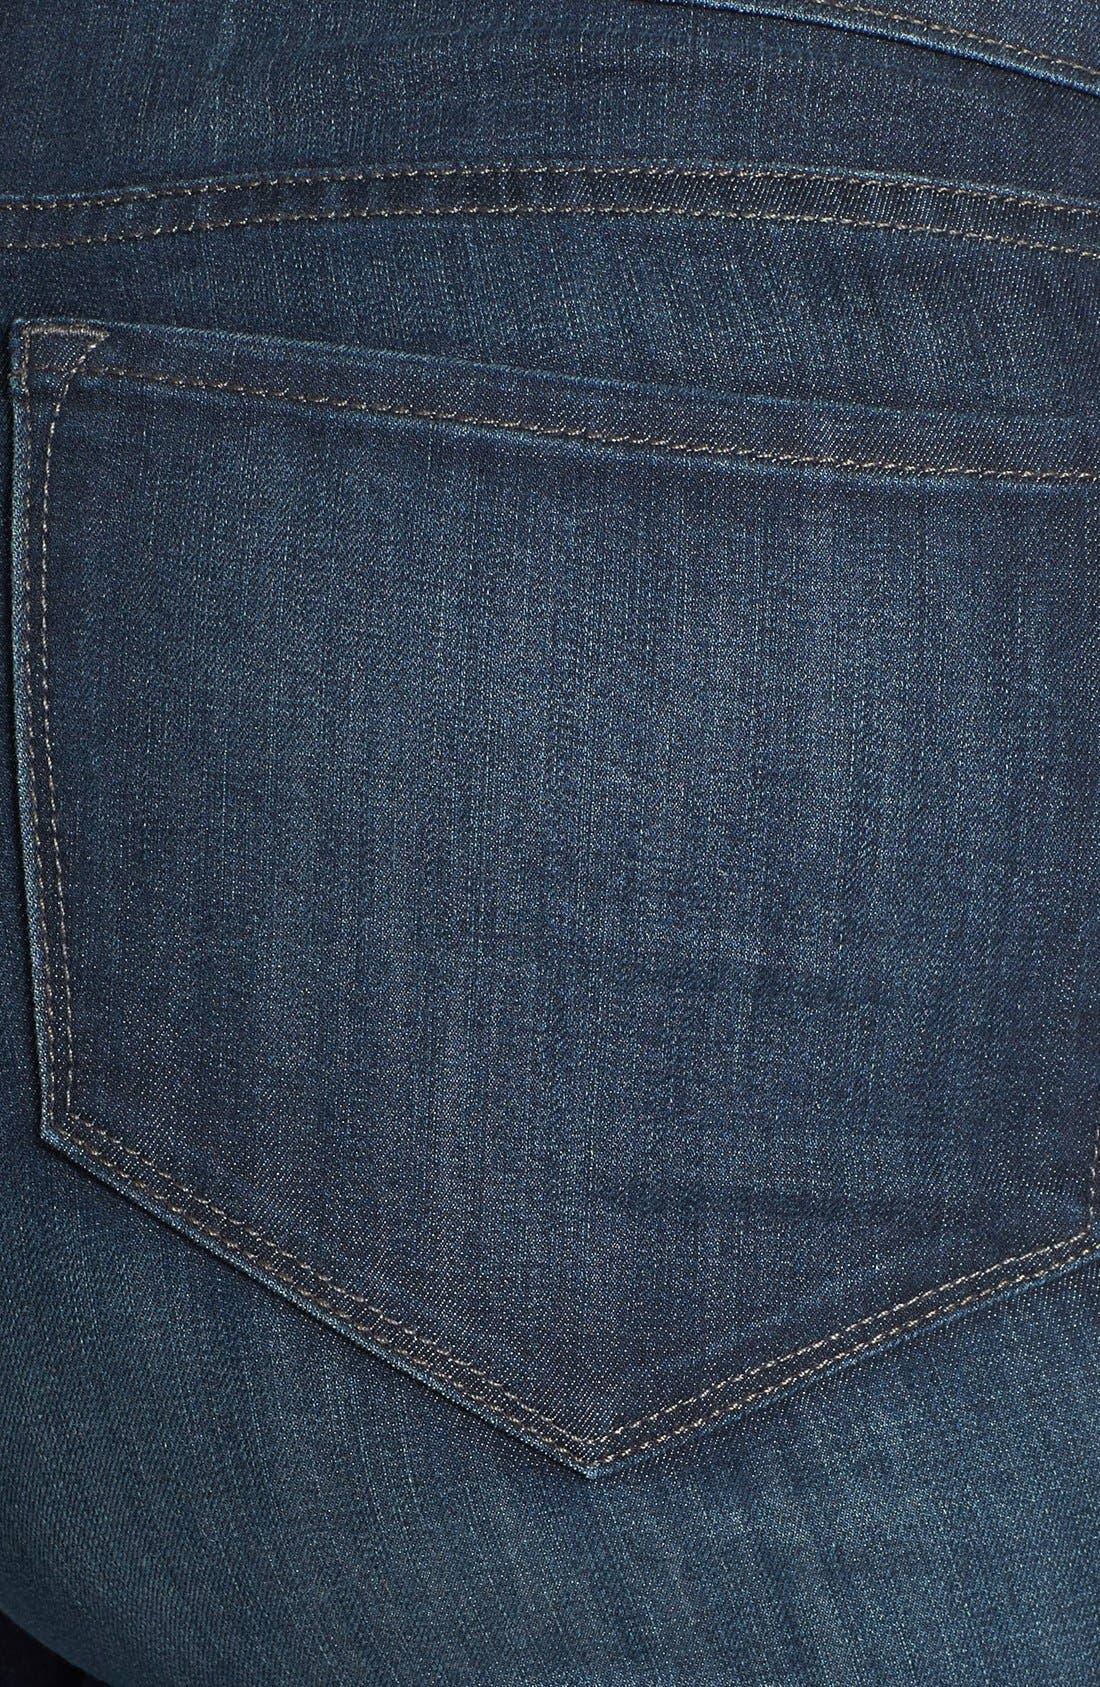 Alternate Image 3  - NYDJ 'Marilyn' Stretch Straight Leg Jeans (Harrington) (Plus Size)